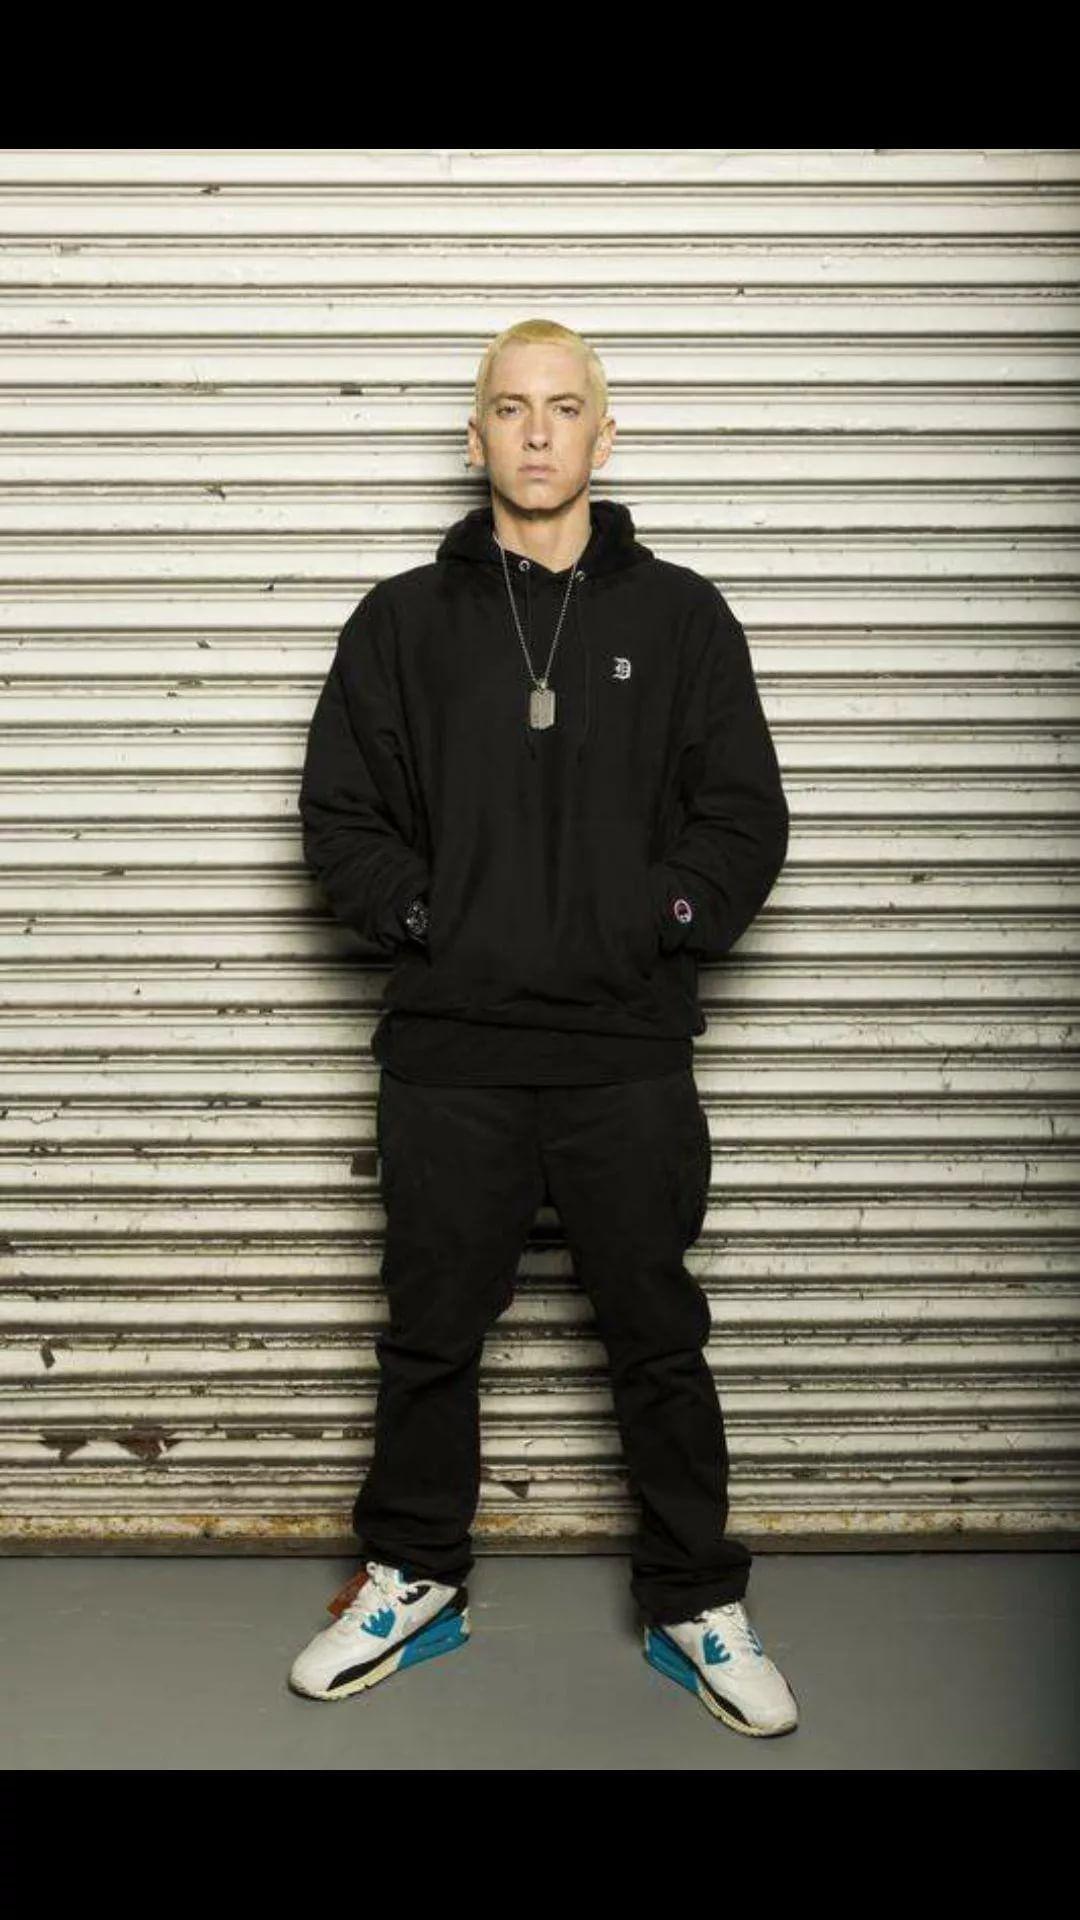 Eminem Samsung s8 wallpaper